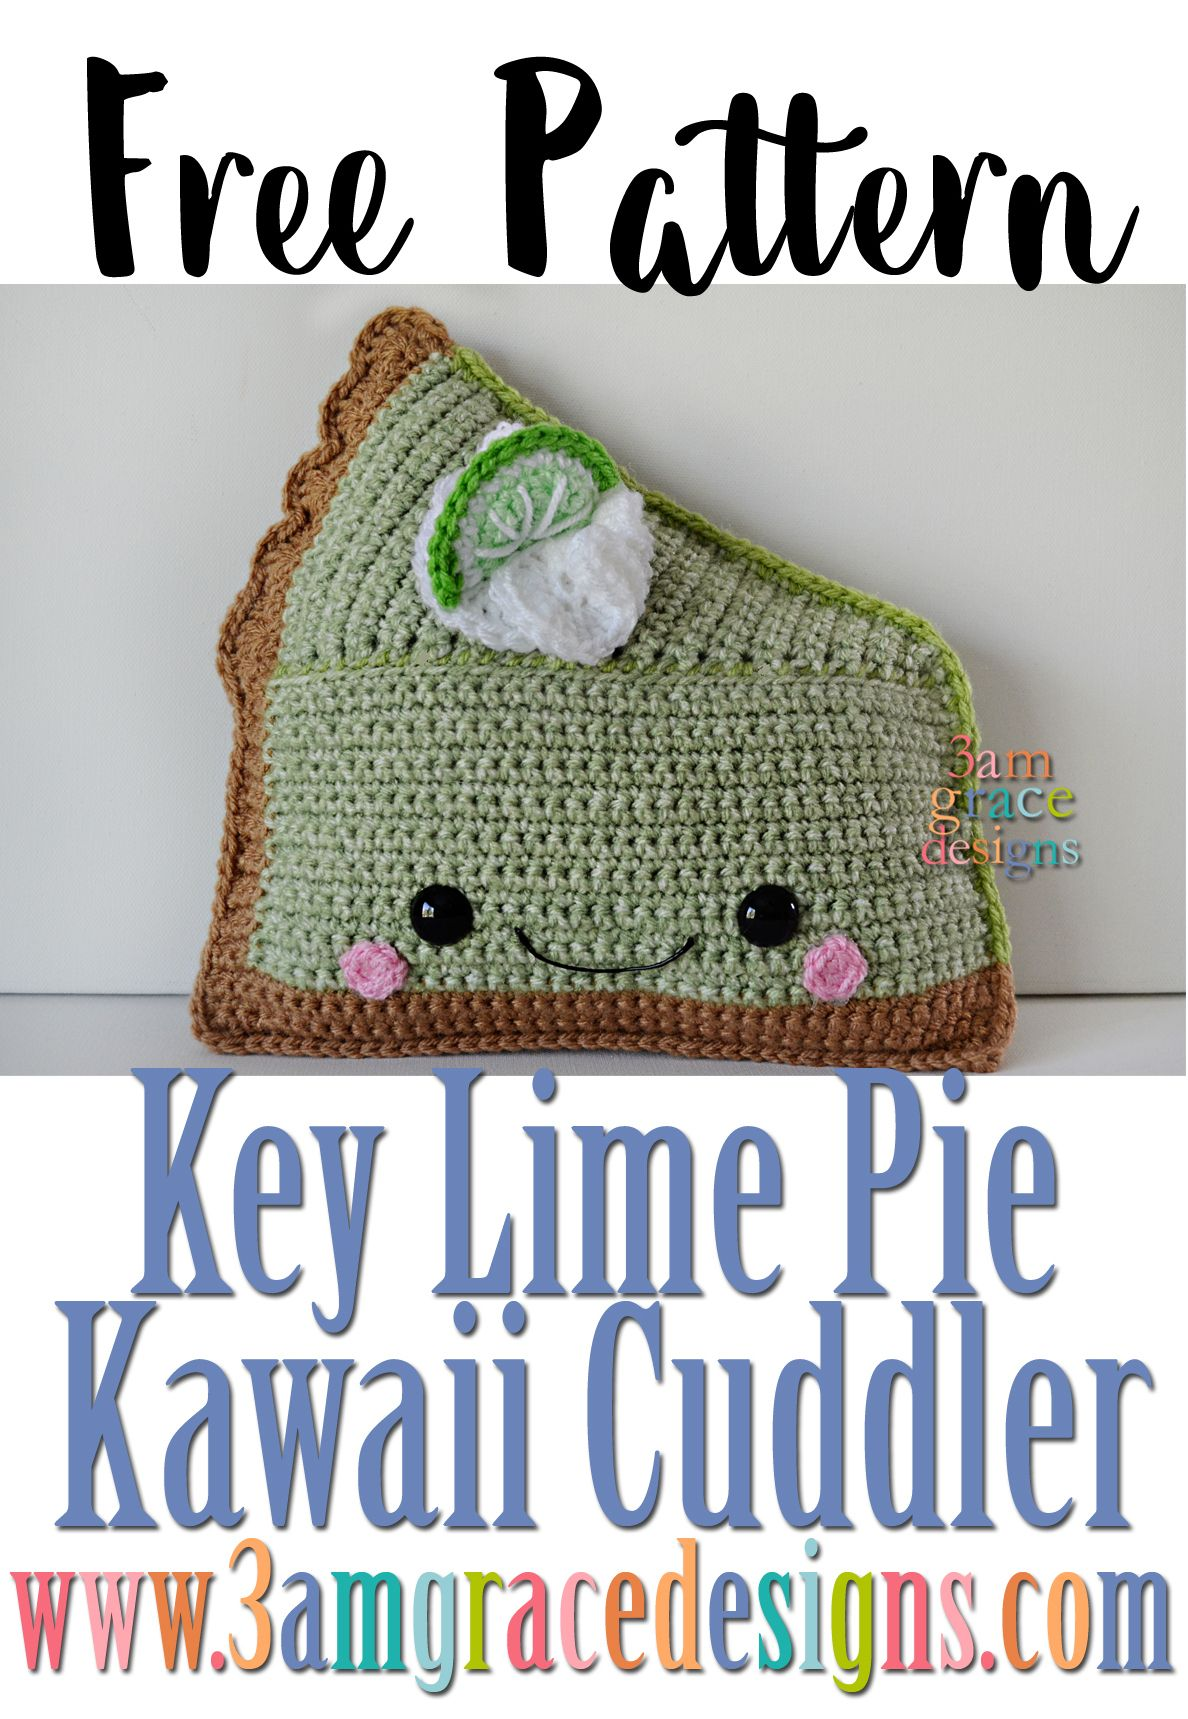 Key lime pie kawaii cuddler free crochet pattern inspired by key lime pie kawaii cuddler free crochet pattern inspired by the frosted pumpkin stitchery bankloansurffo Choice Image